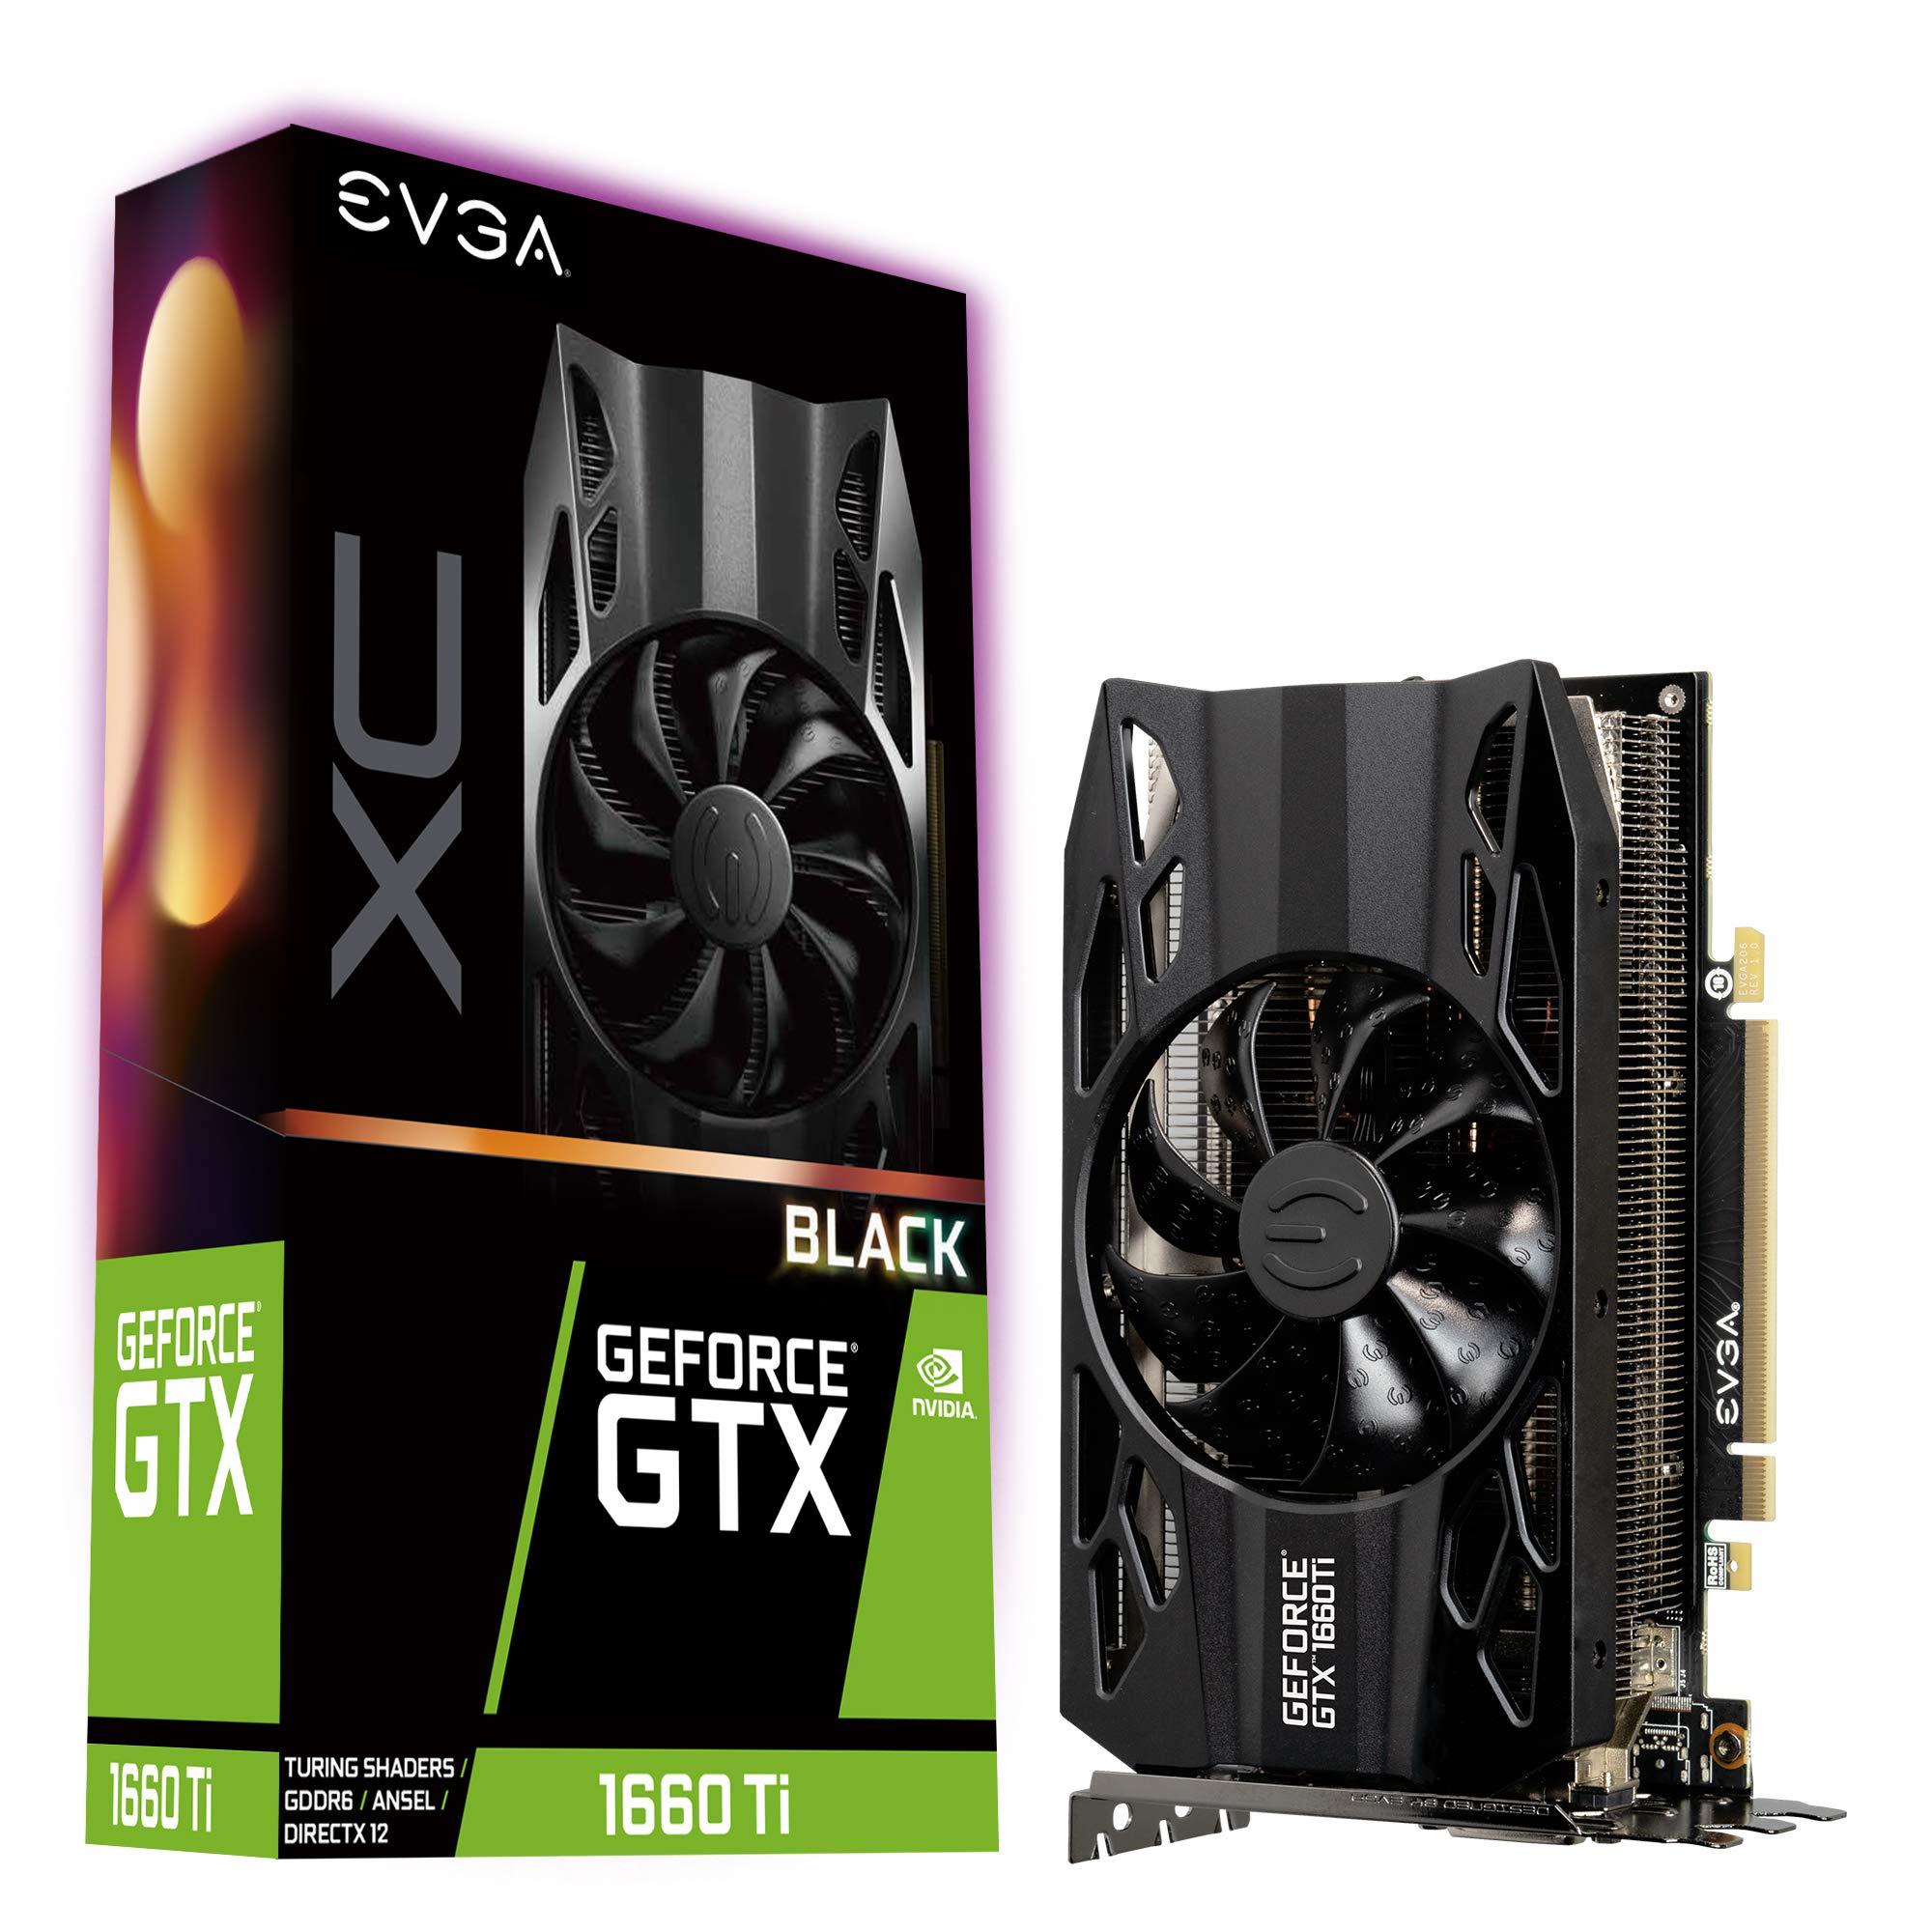 EVGA GeForce GTX 1660 Ti XC Black Gaming, 6GB GDDR6, HDB Fan Graphics Card 06G-P4-1261-KR by EVGA